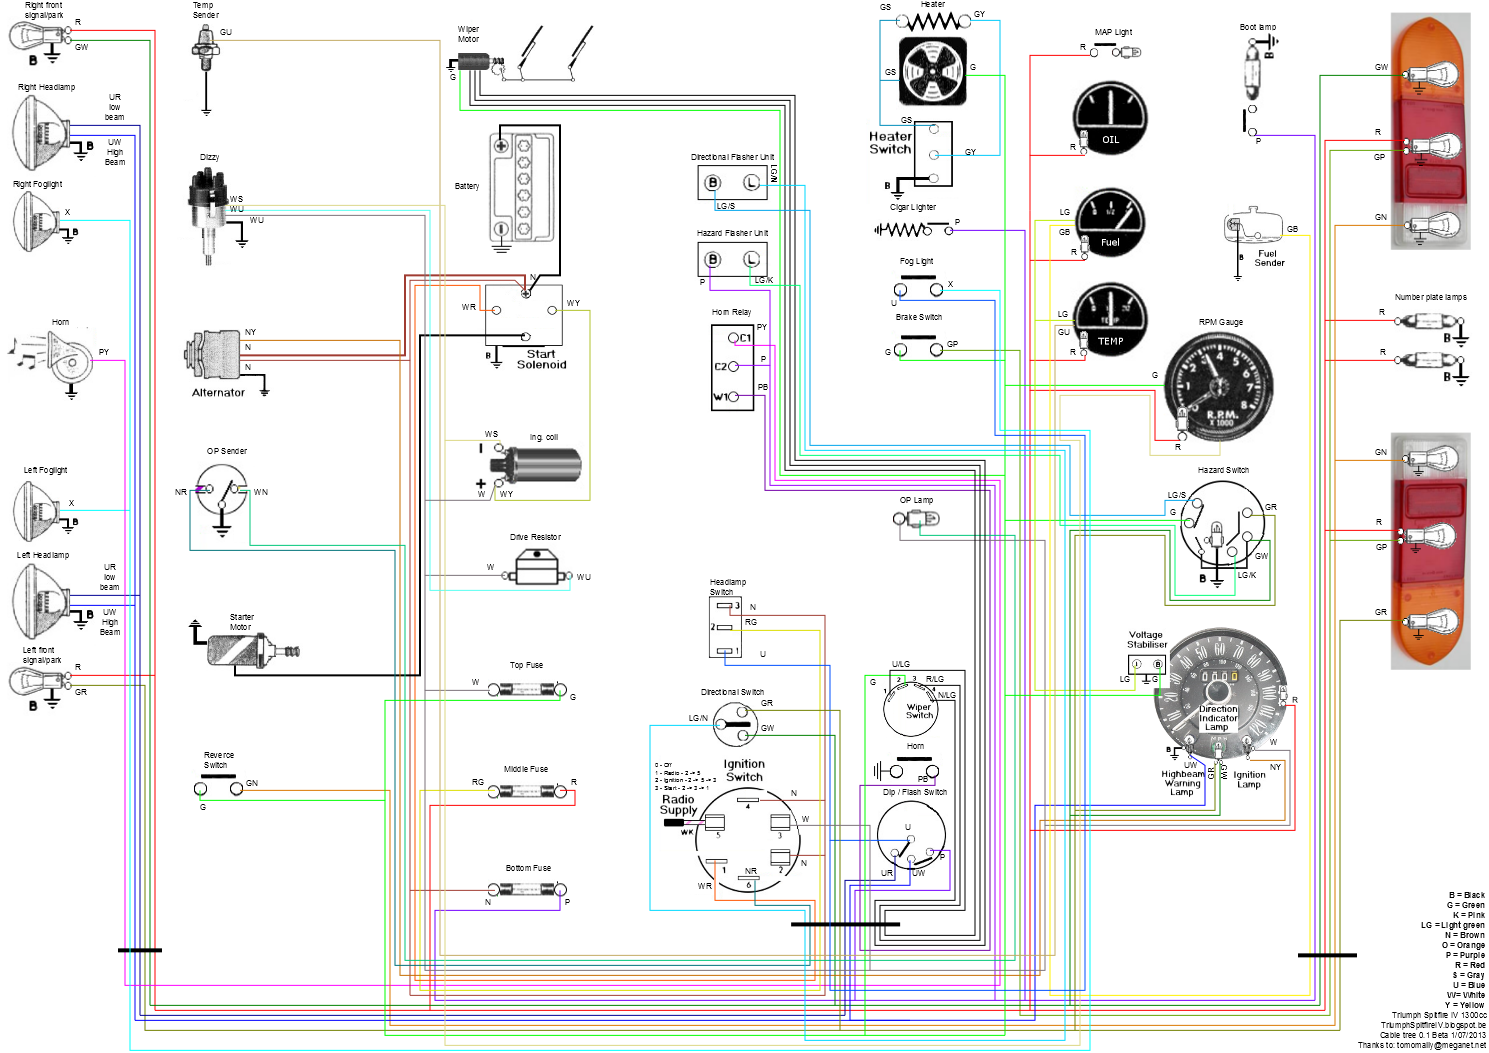 hight resolution of 1980 spitfire wiring diagram wiring diagram paper spitfire 1500 wire harness diagram